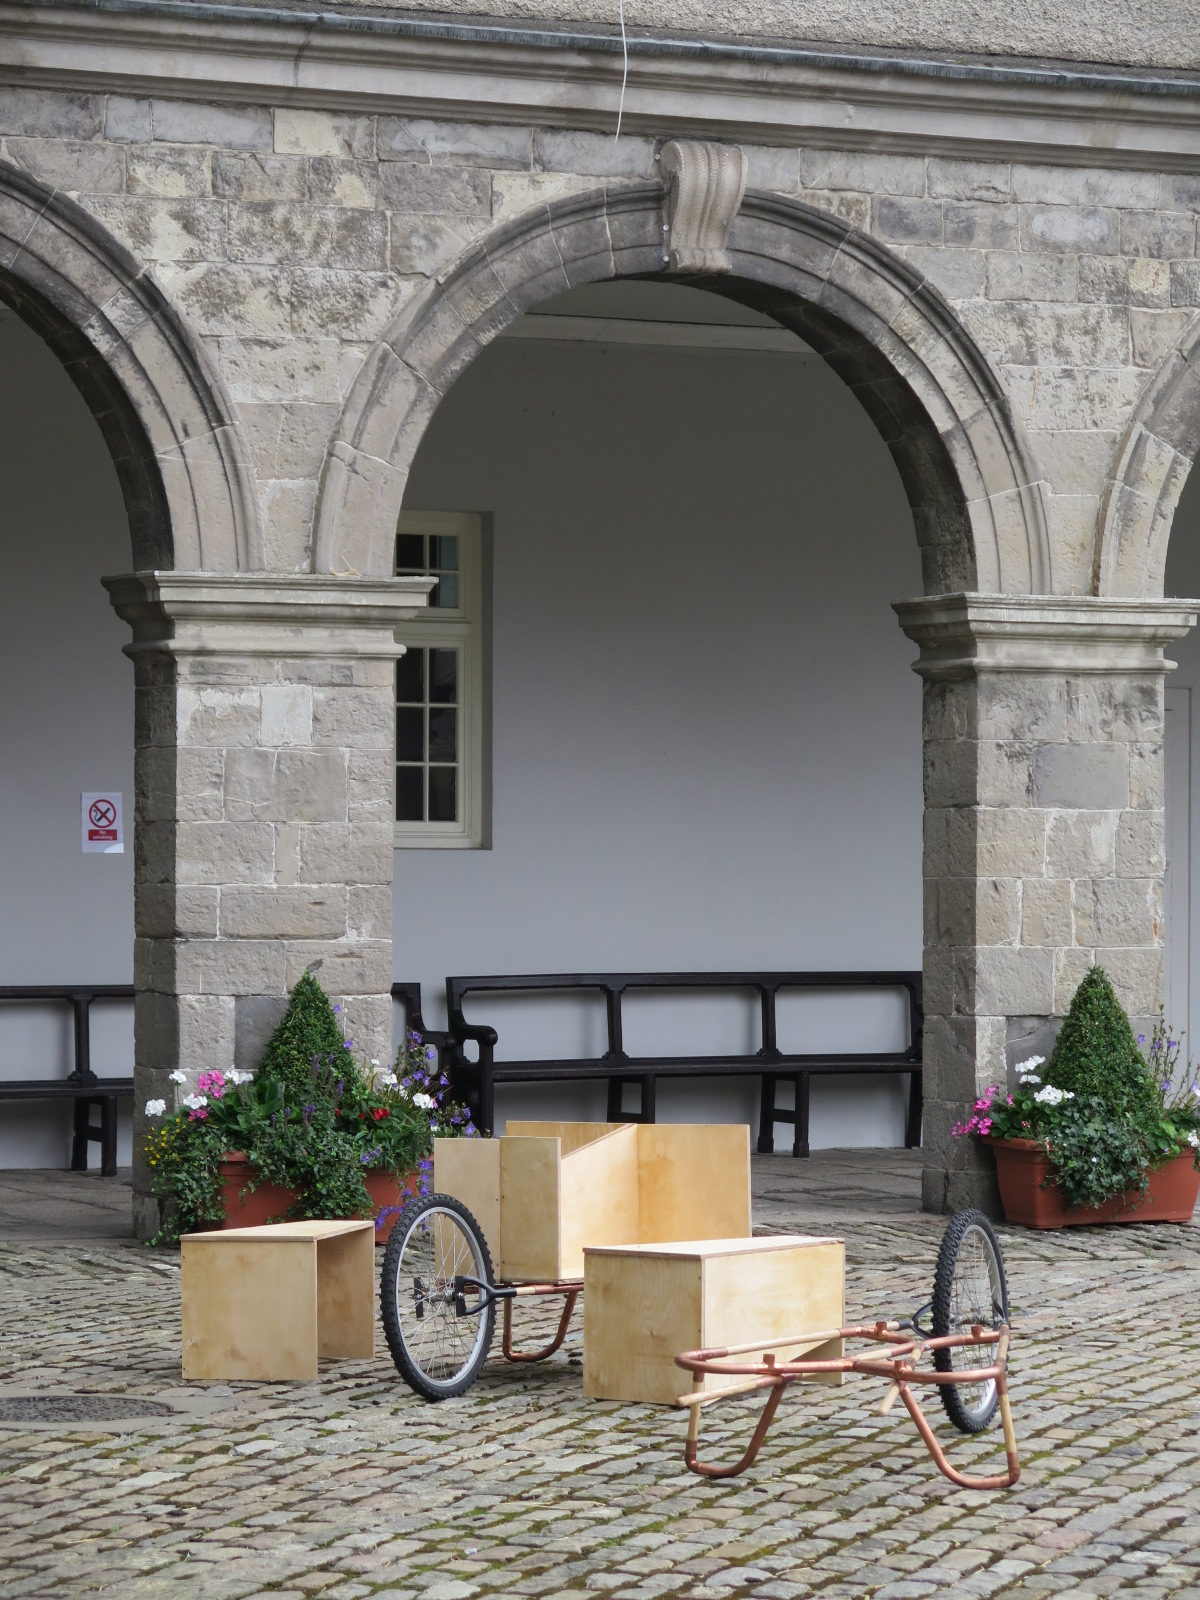 wheelbarrow and mobile bench in IMMA Courtyard